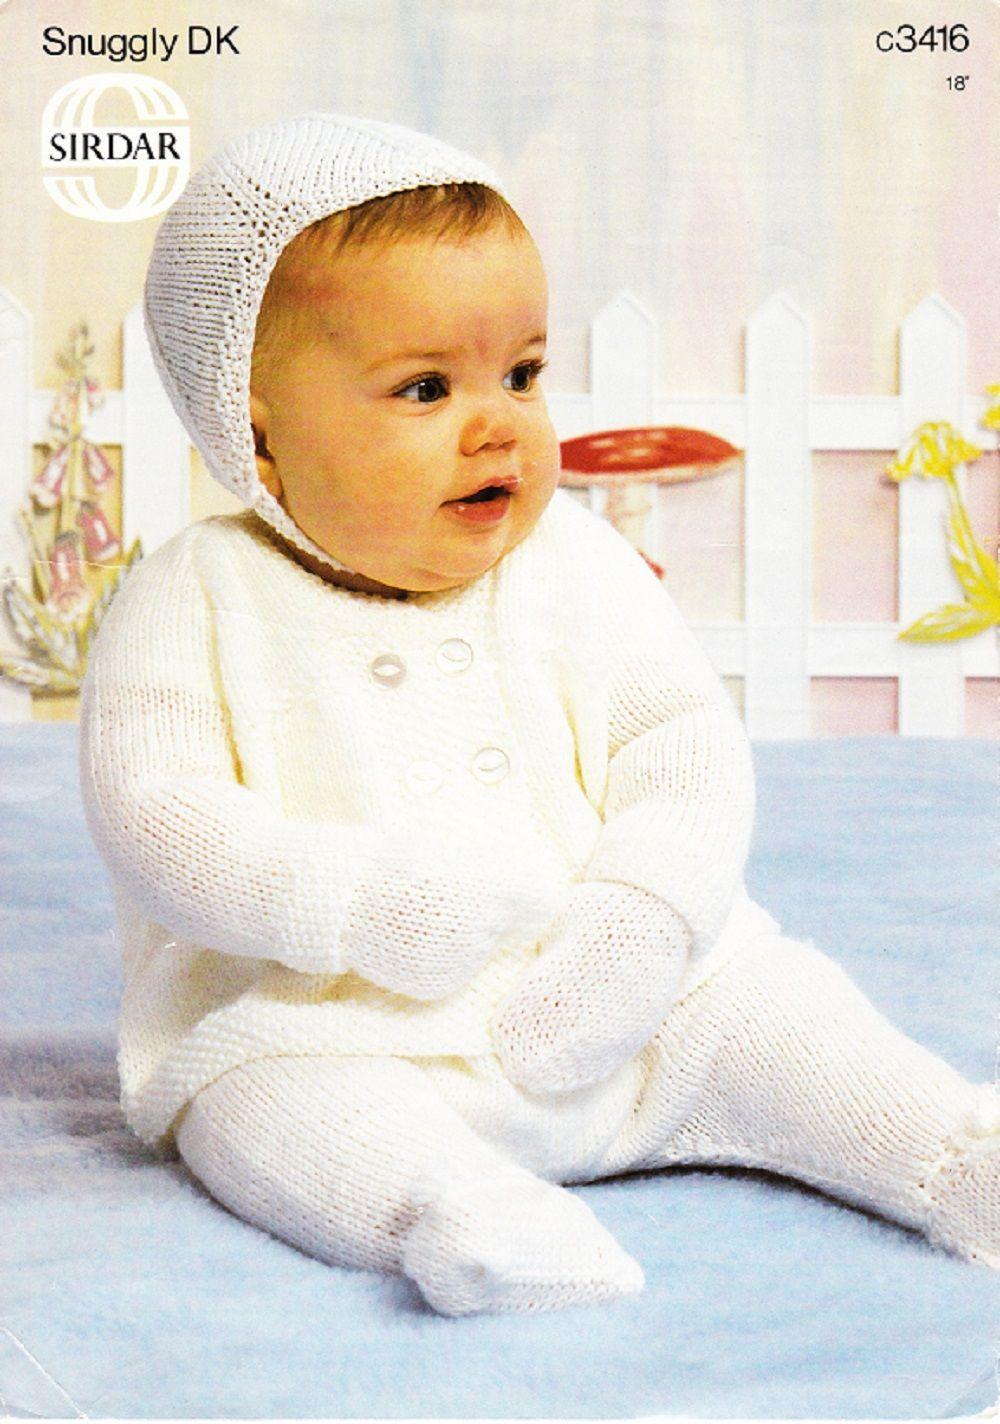 Sirdar knitting pattern c3416 dk babys pram set pram coat sirdar knitting pattern c3416 dk babys pram set pram coat legginettes bankloansurffo Image collections